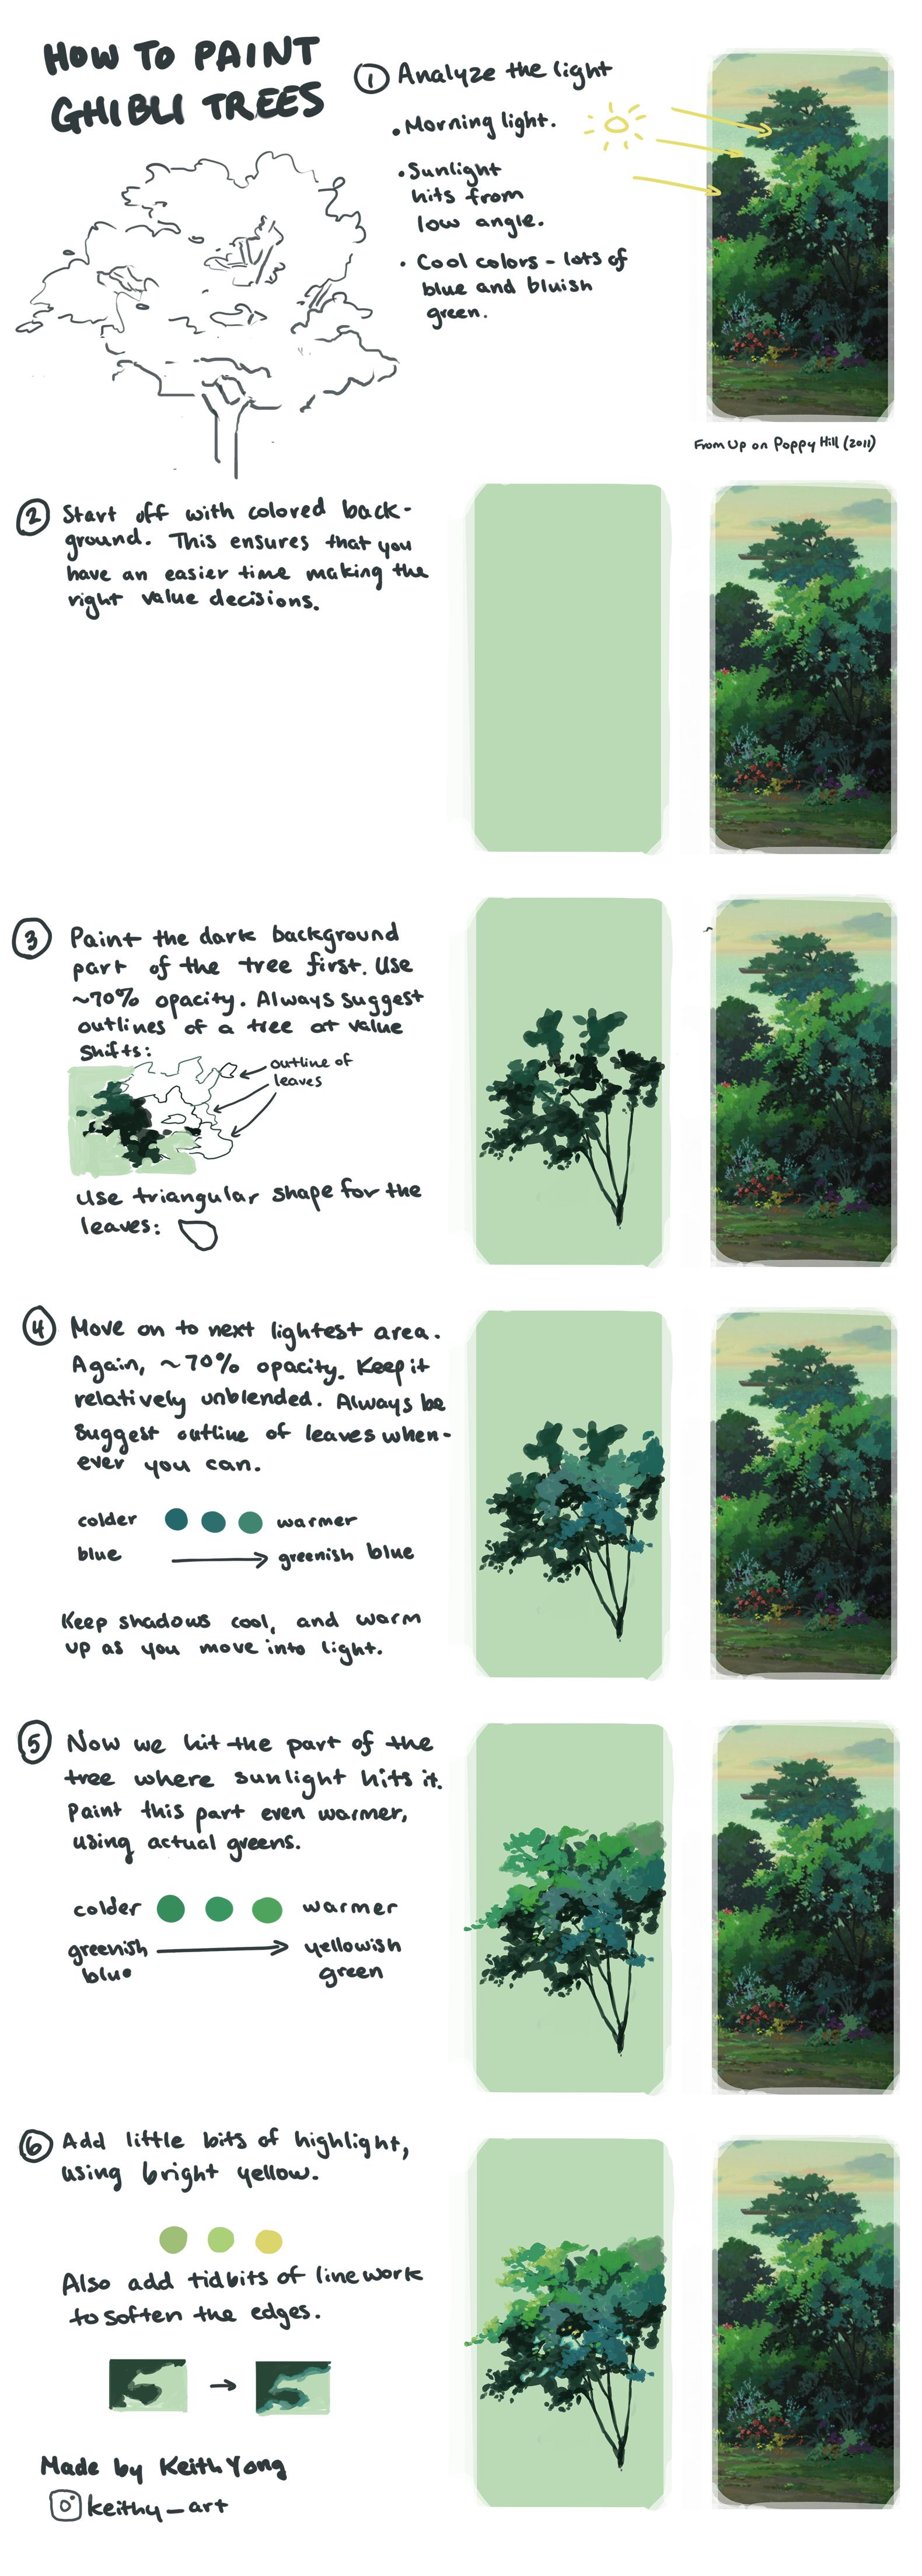 Tutorial On How To Paint Ghibli Style Trees Learnart Digital Painting Tutorials Studio Ghibli Background Digital Art Anime